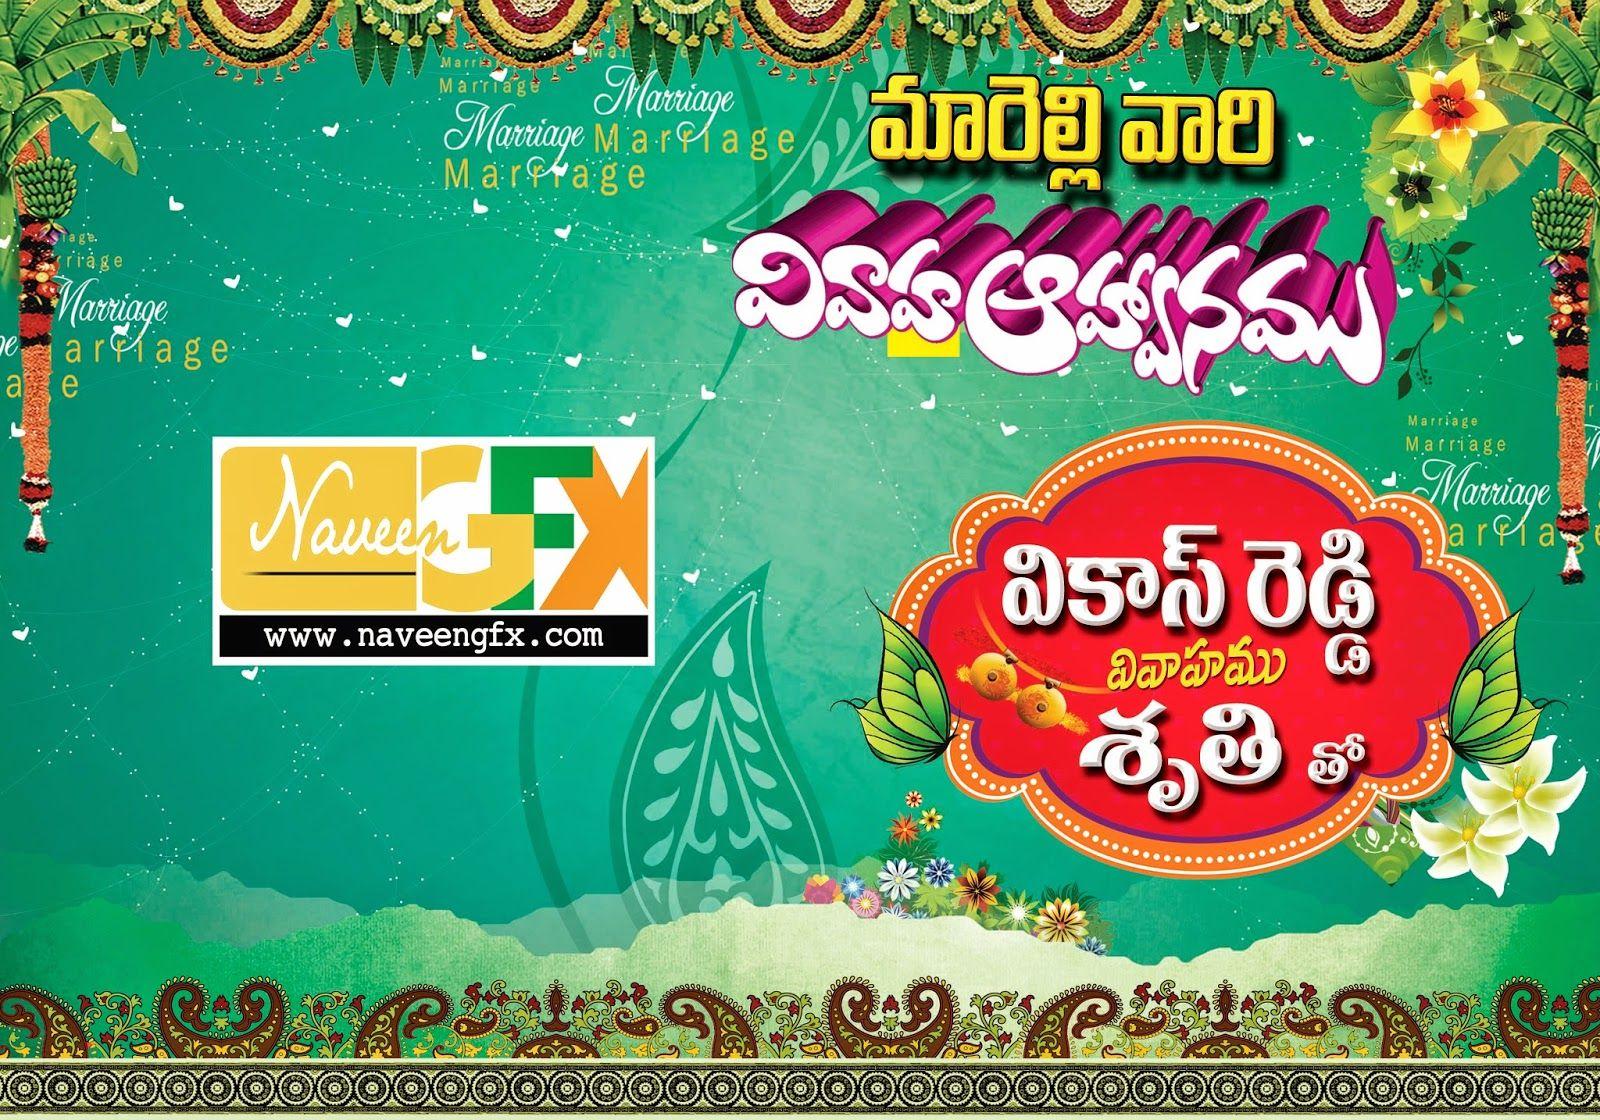 Telugu Wedding Album Design Tutalo Parkersydnorhistoric Org